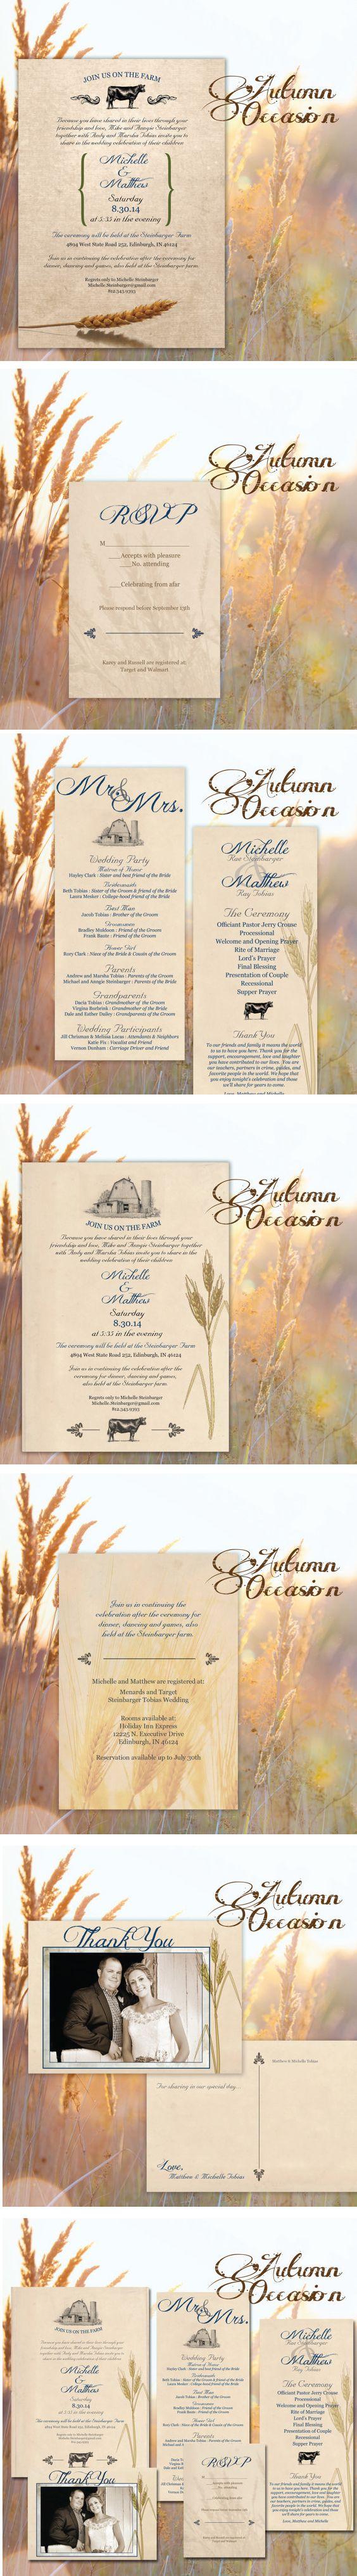 79 best Wedding Invitations, Programs, decor images on Pinterest ...